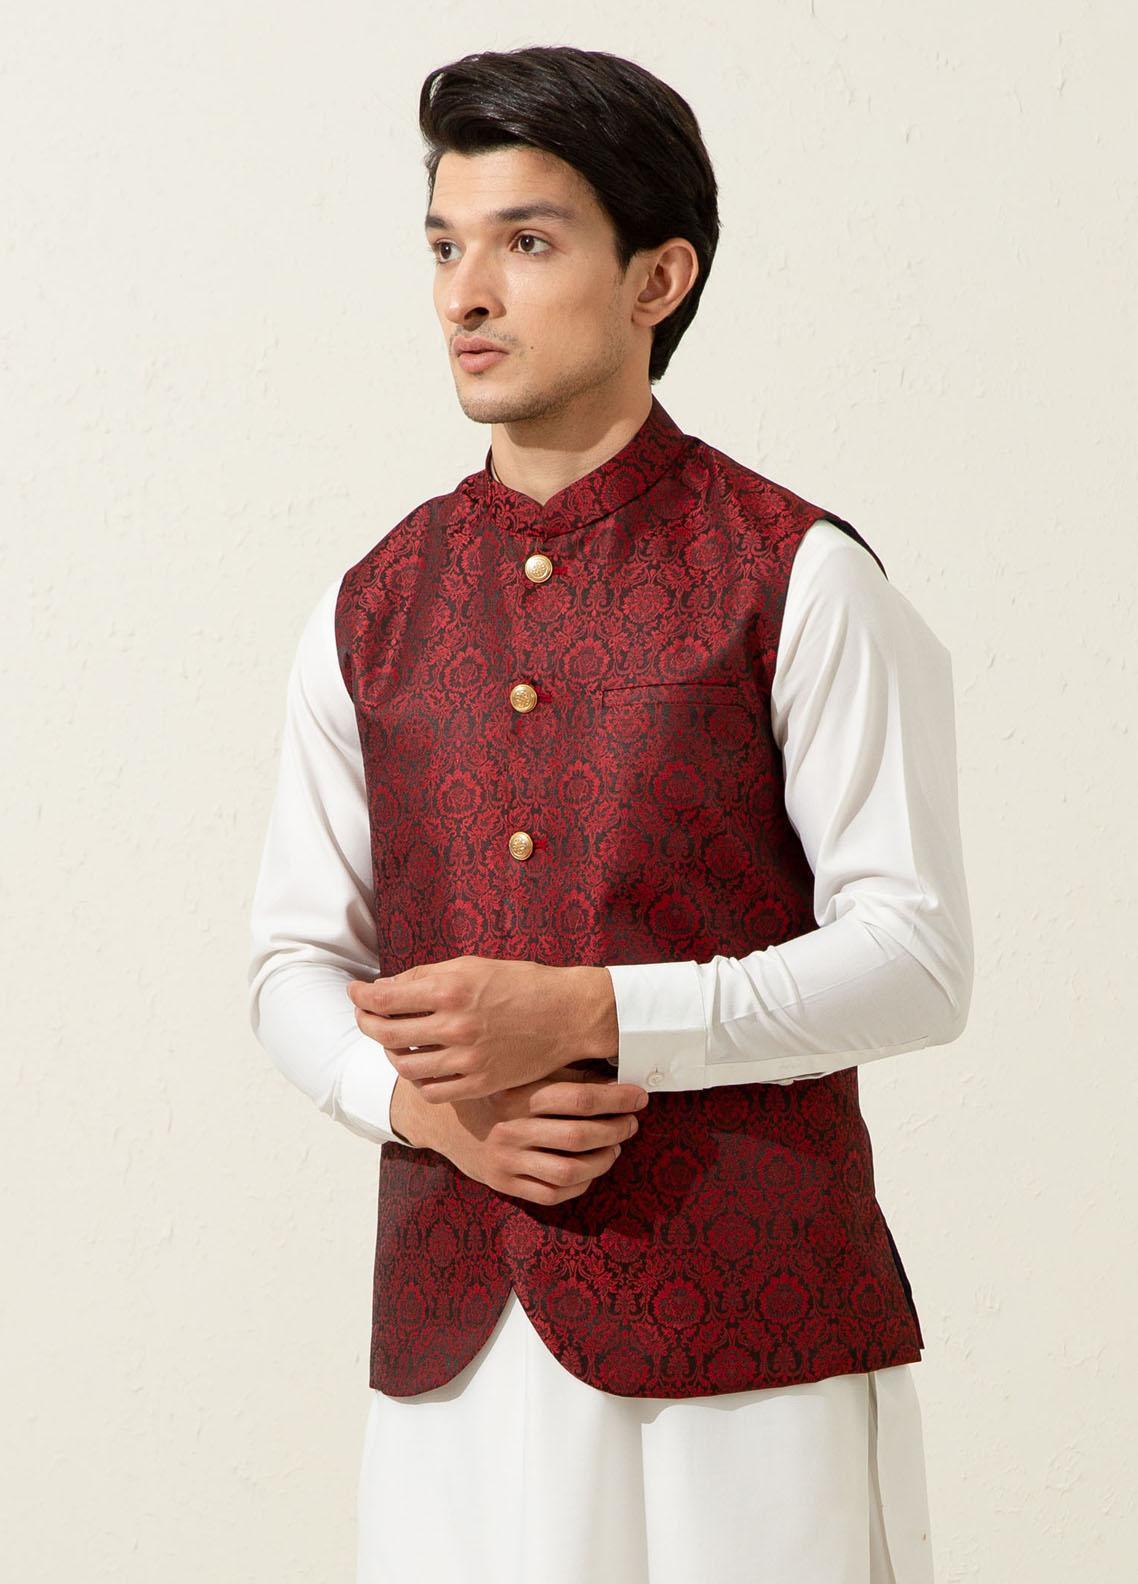 Brumano Polyester Formal Men Waistcoat -  Maroon Floral Patterned